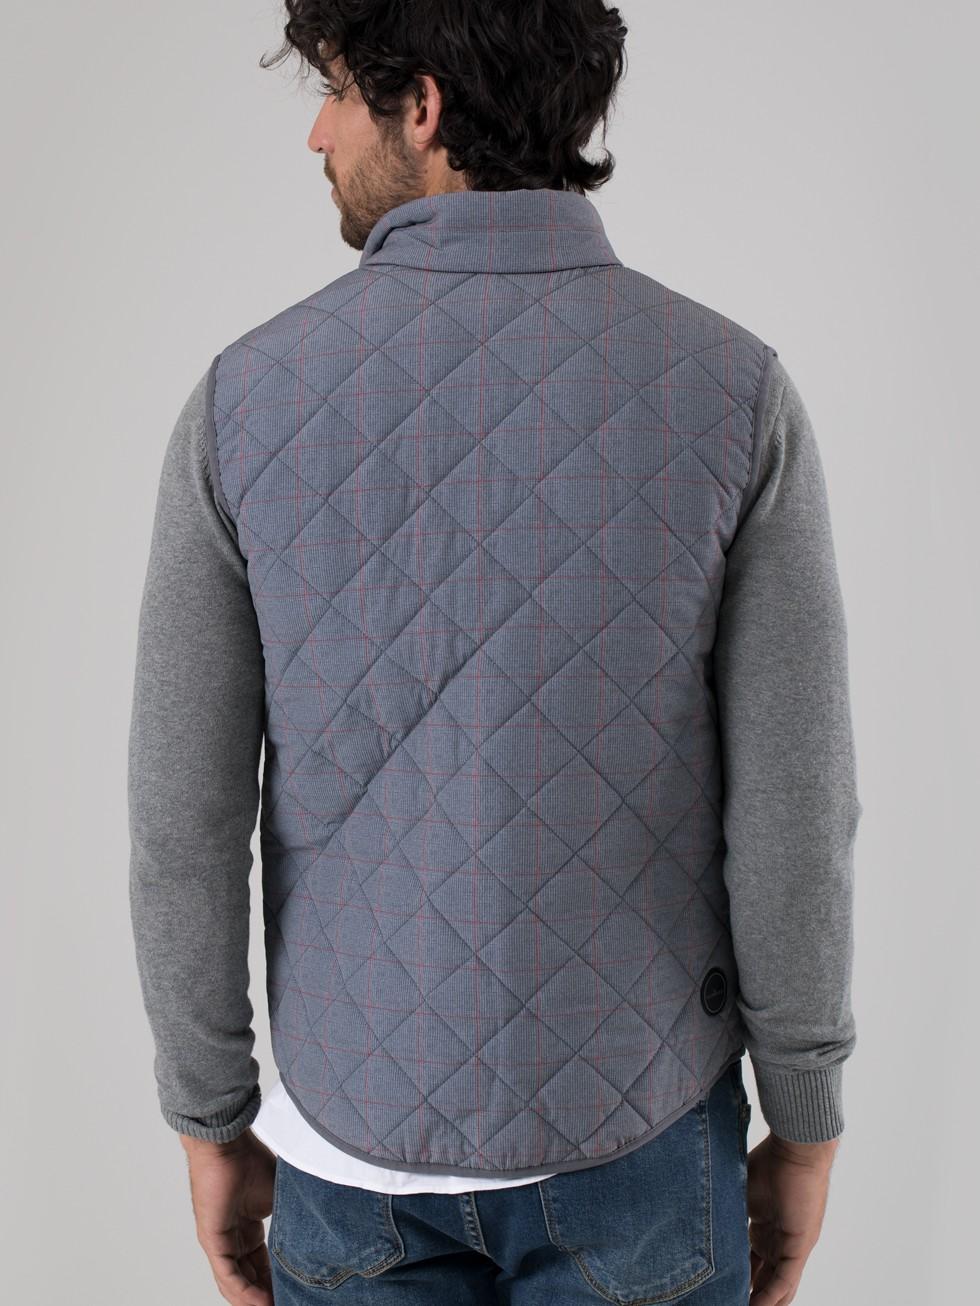 Chaleco acolchado cuadro gris